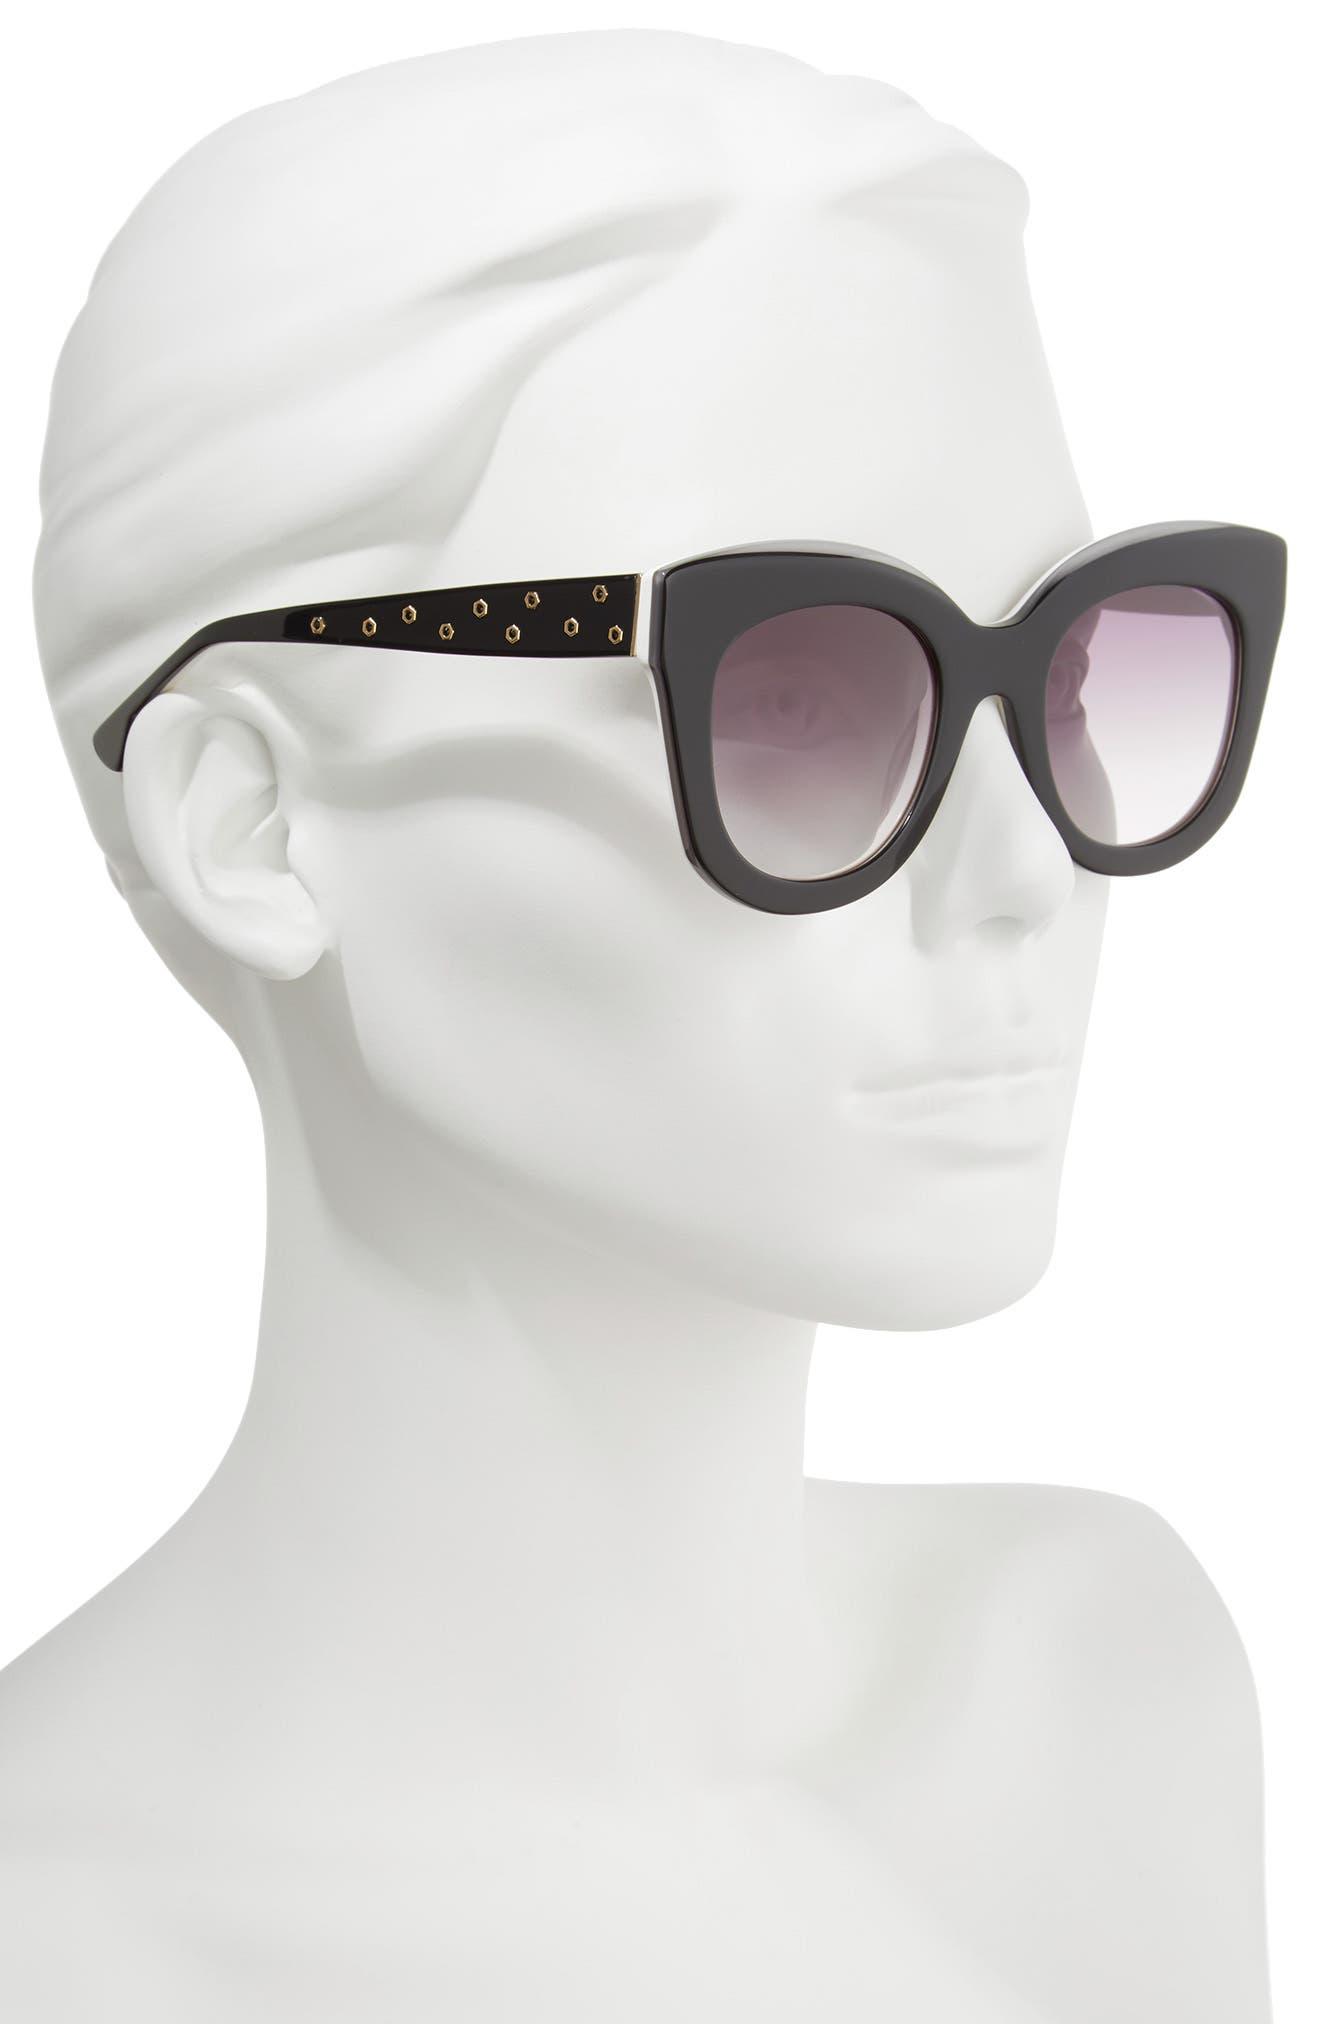 Downing 51mm Cat Eye Sunglasses,                             Alternate thumbnail 2, color,                             001